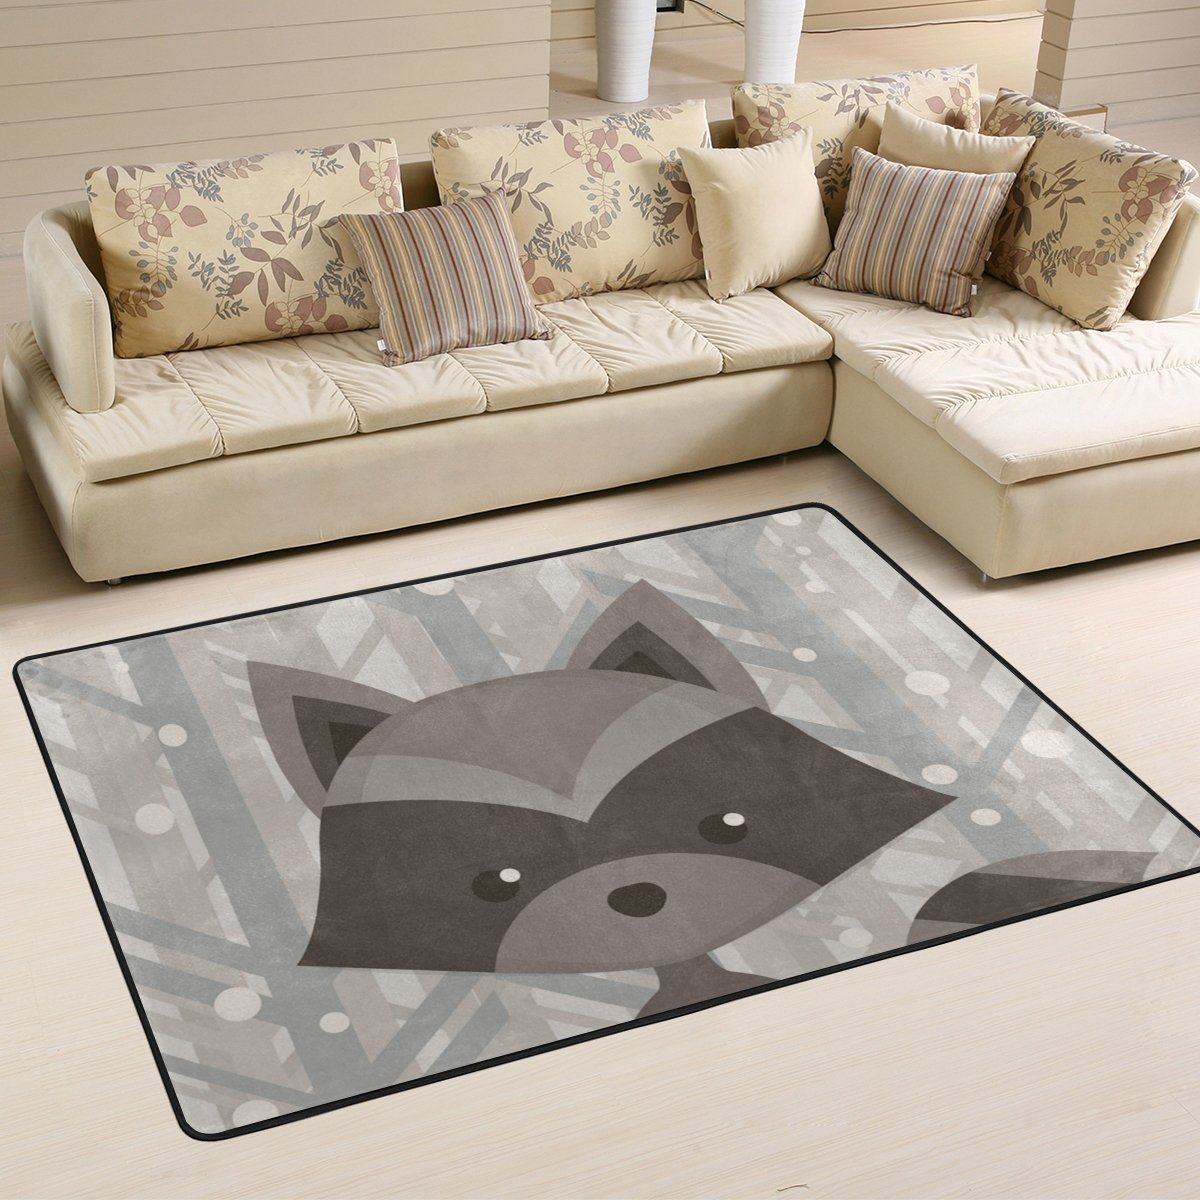 SAVSV 6' x 4' Area Rug Carpet Doormat Lightweight Printed Cartoon Raccoon Pattern Easy to Clean For Living Room Bedroom